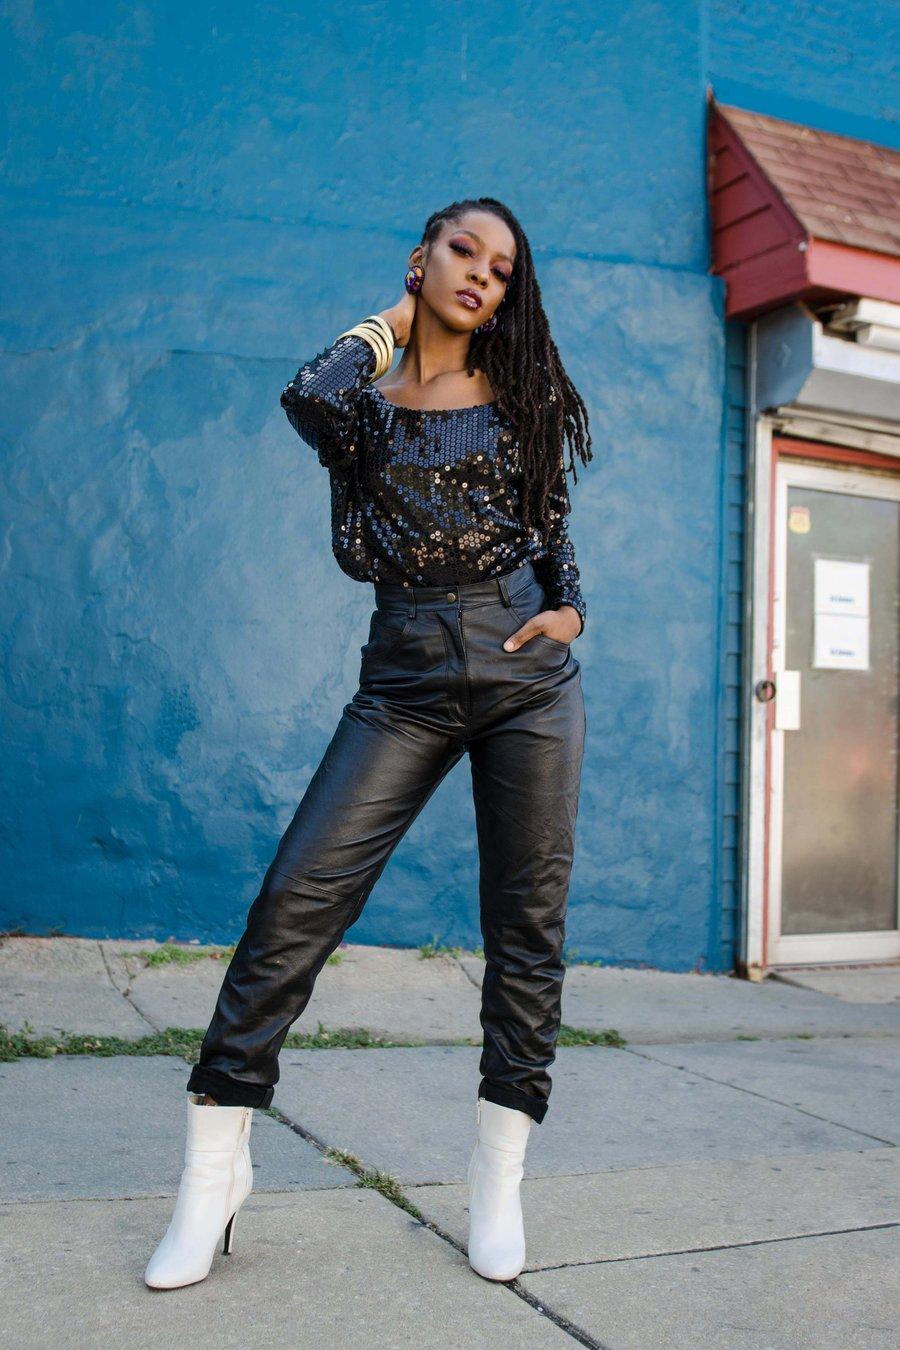 Image of Vintage Black Magic Sequin Bodysuit